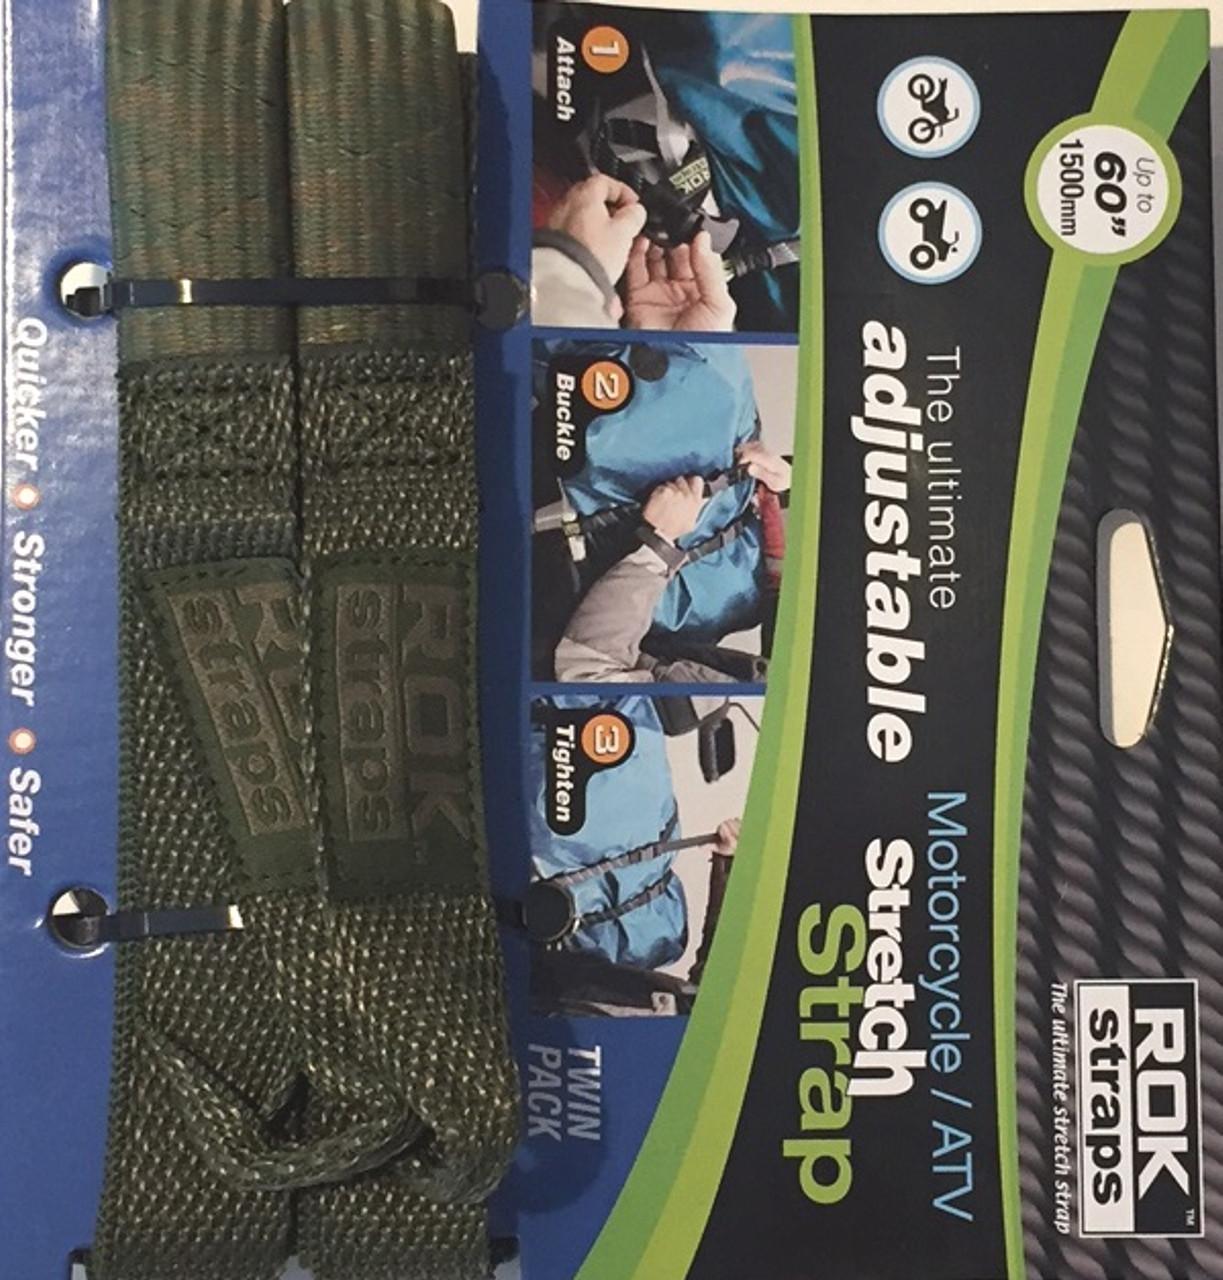 ROK Straps Motorcycle Adjustable Strap 60 x 1 inch Green Camo